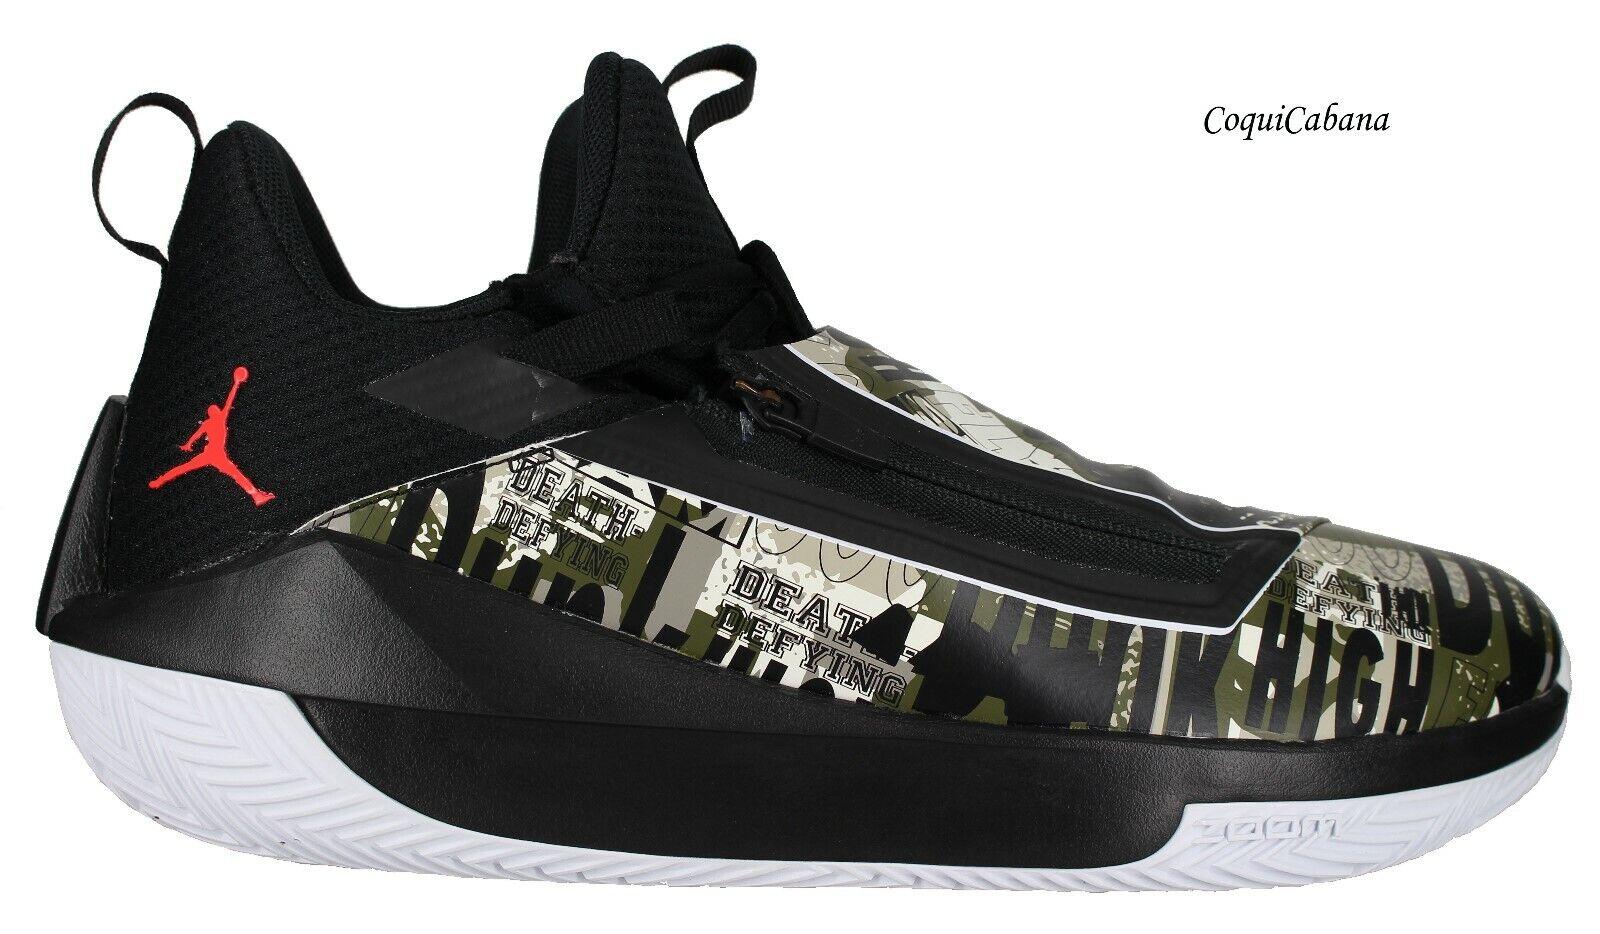 Nike Men's  Jordan Jumpman Hustle  Black - Olive Basketball shoes Multiple Size